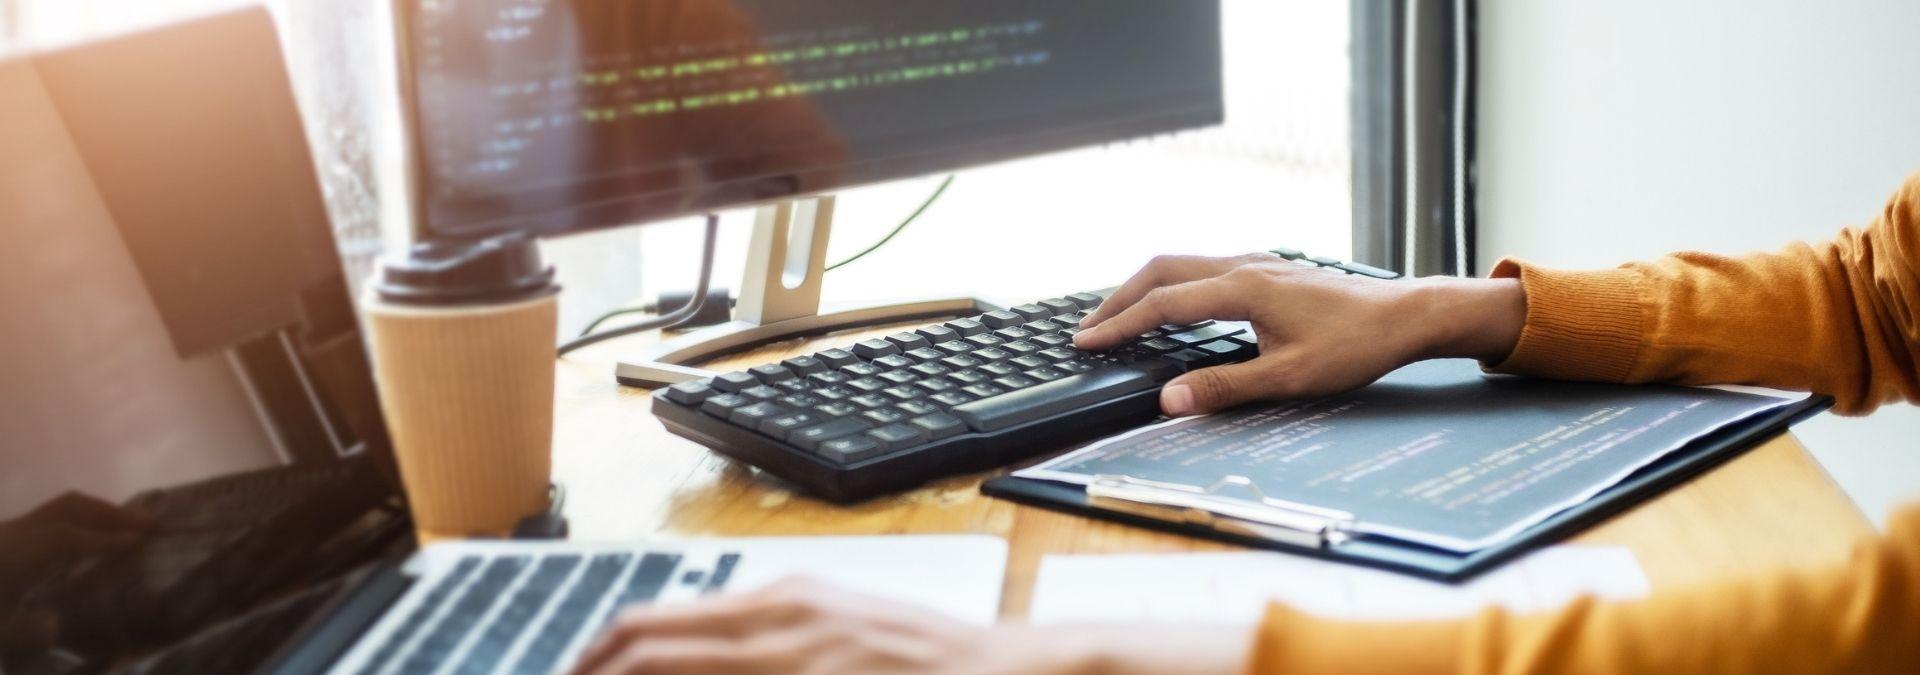 IT-Web & Software Developer